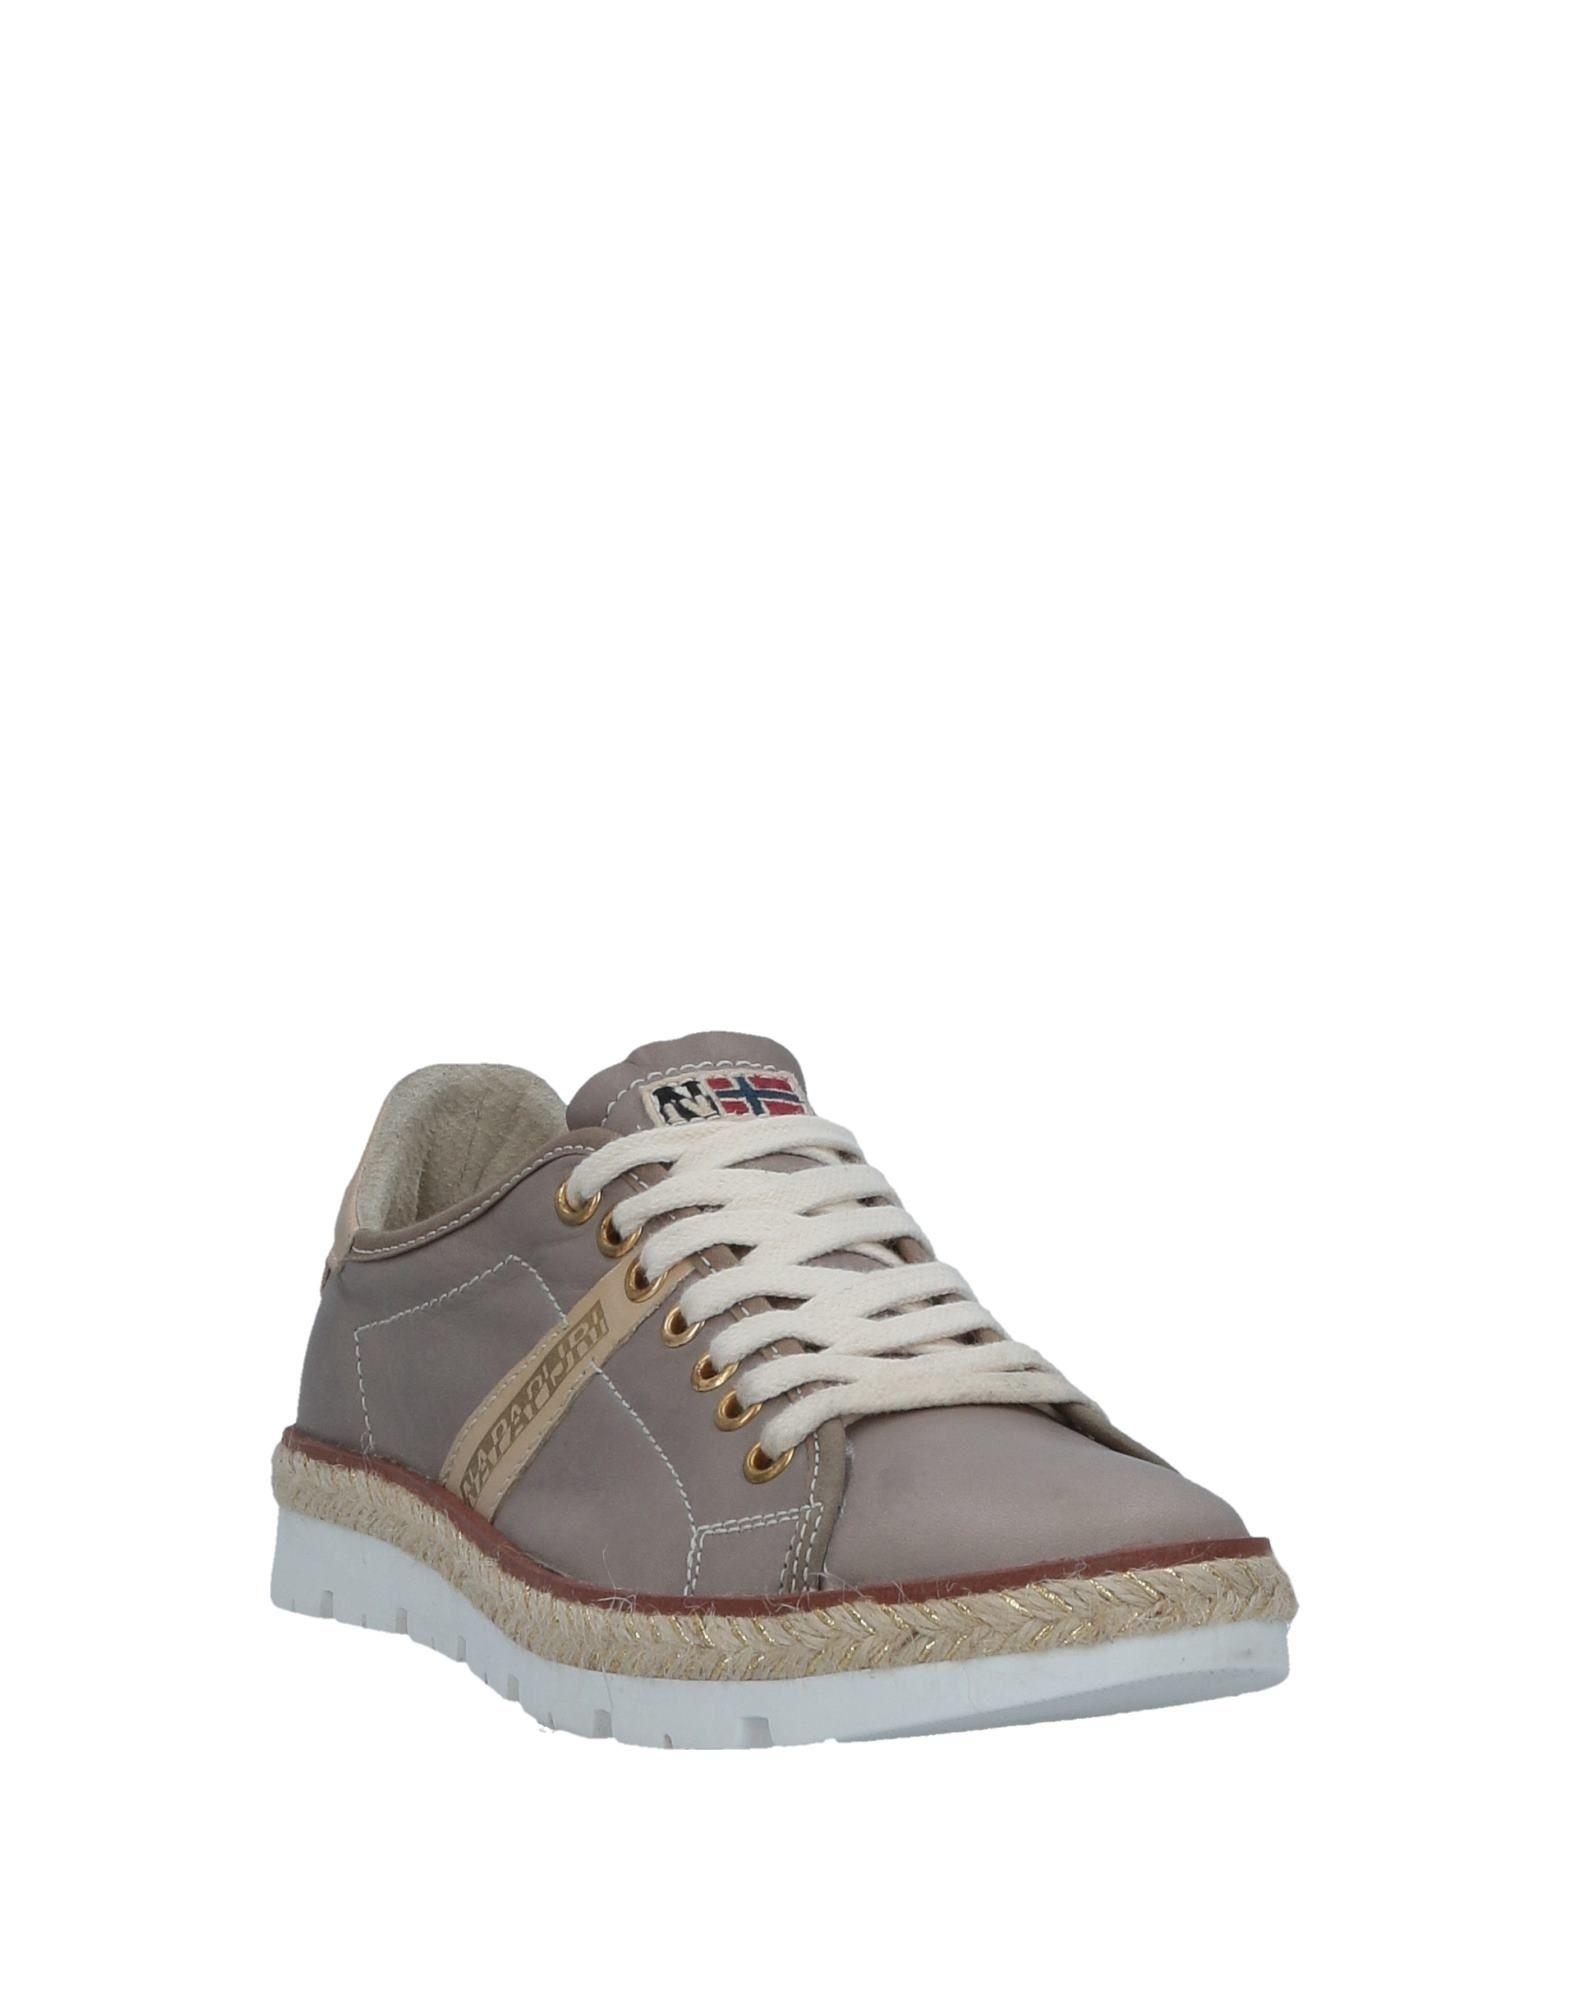 Napapijri Sneakers Damen   Damen 11525555LB  df131c